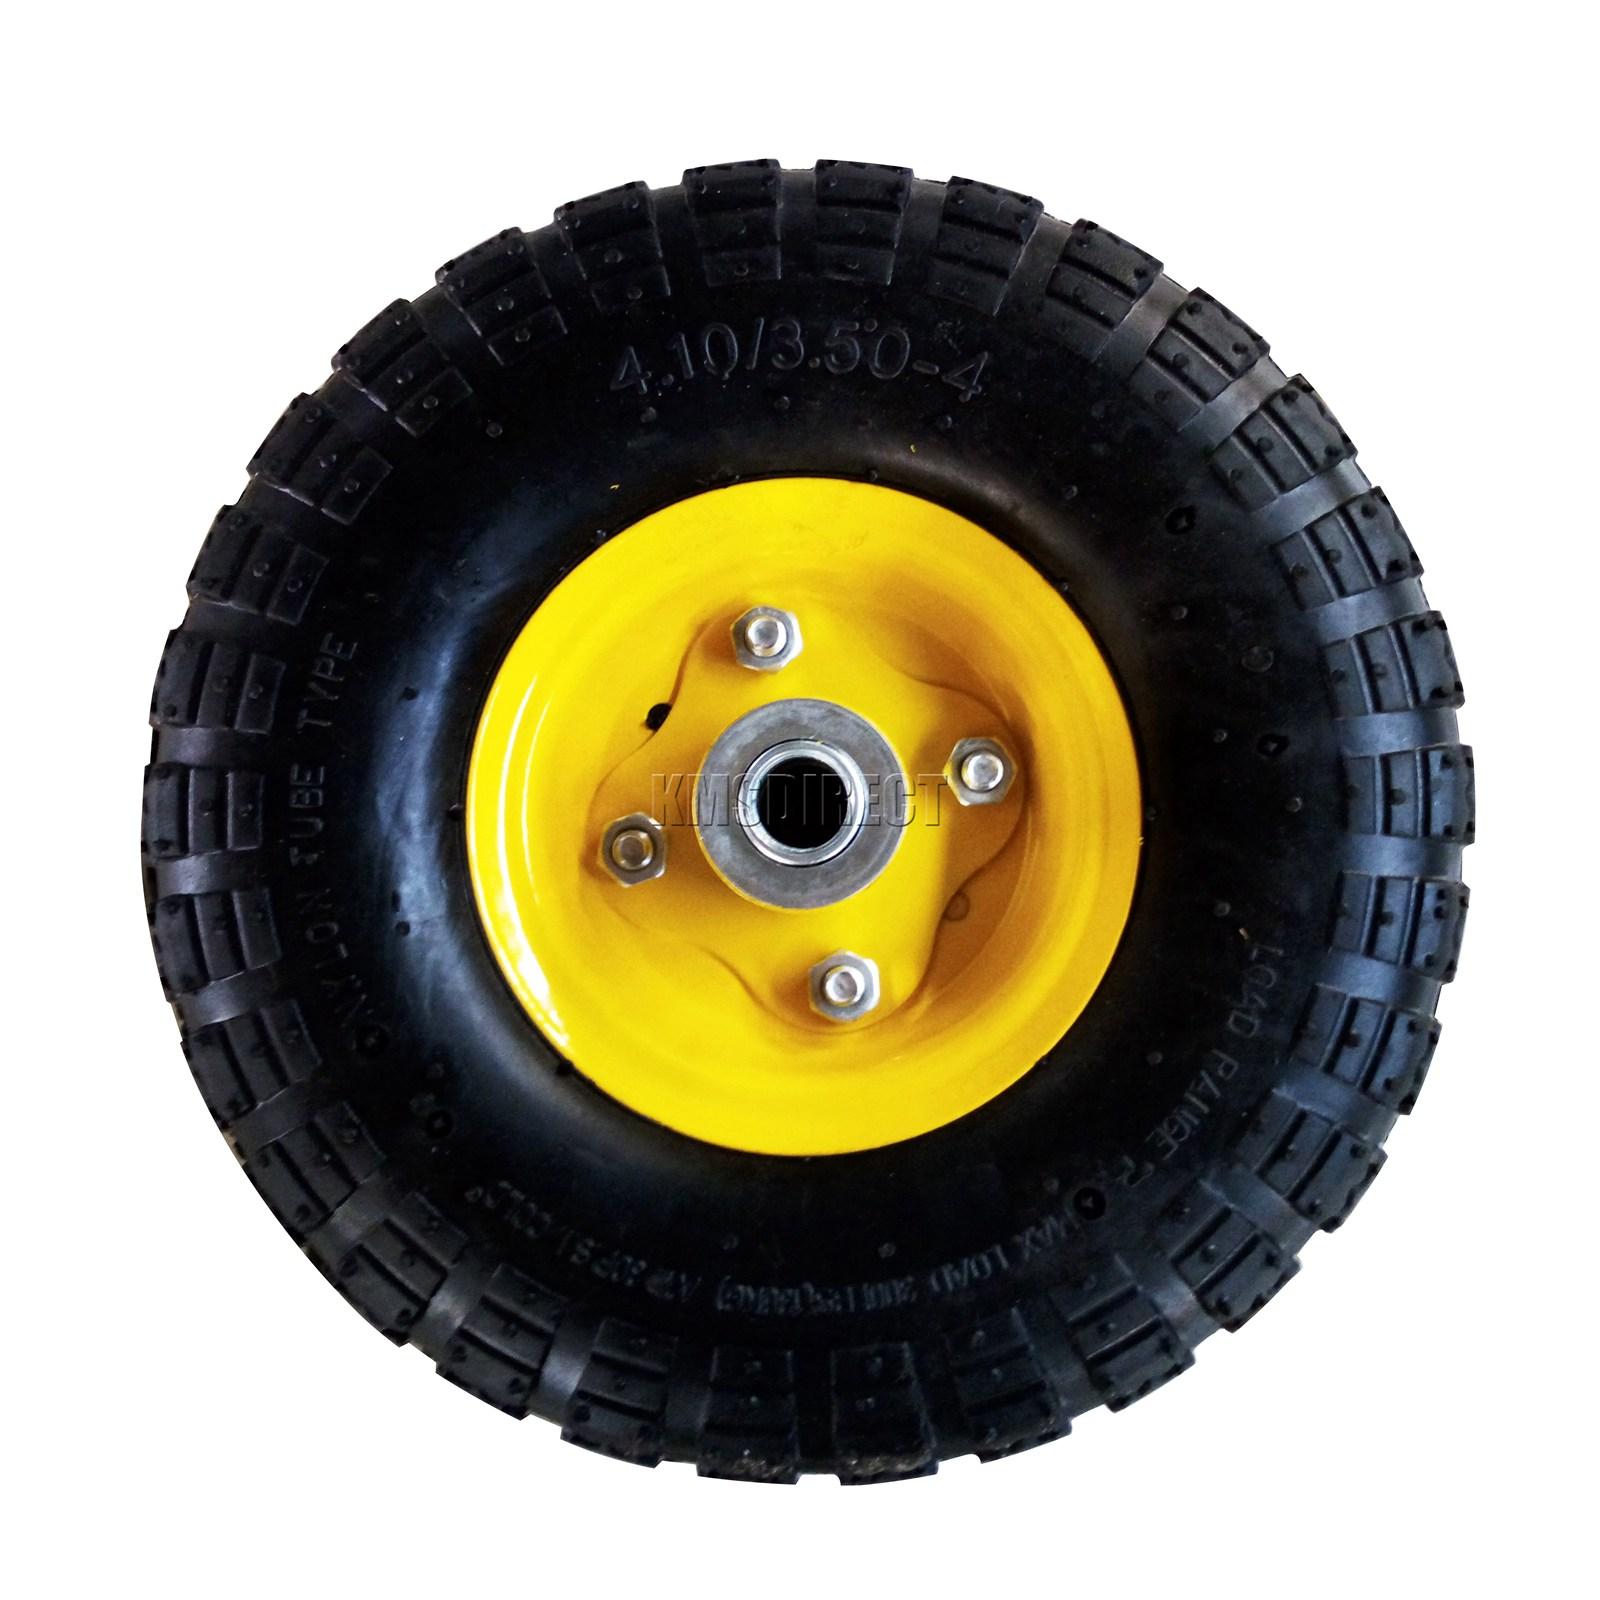 FoxHunter-Heavy-Duty-Garden-Dump-Truck-Tipping-Trailer-Trolley-Cart-Wheelbarrow miniatuur 18